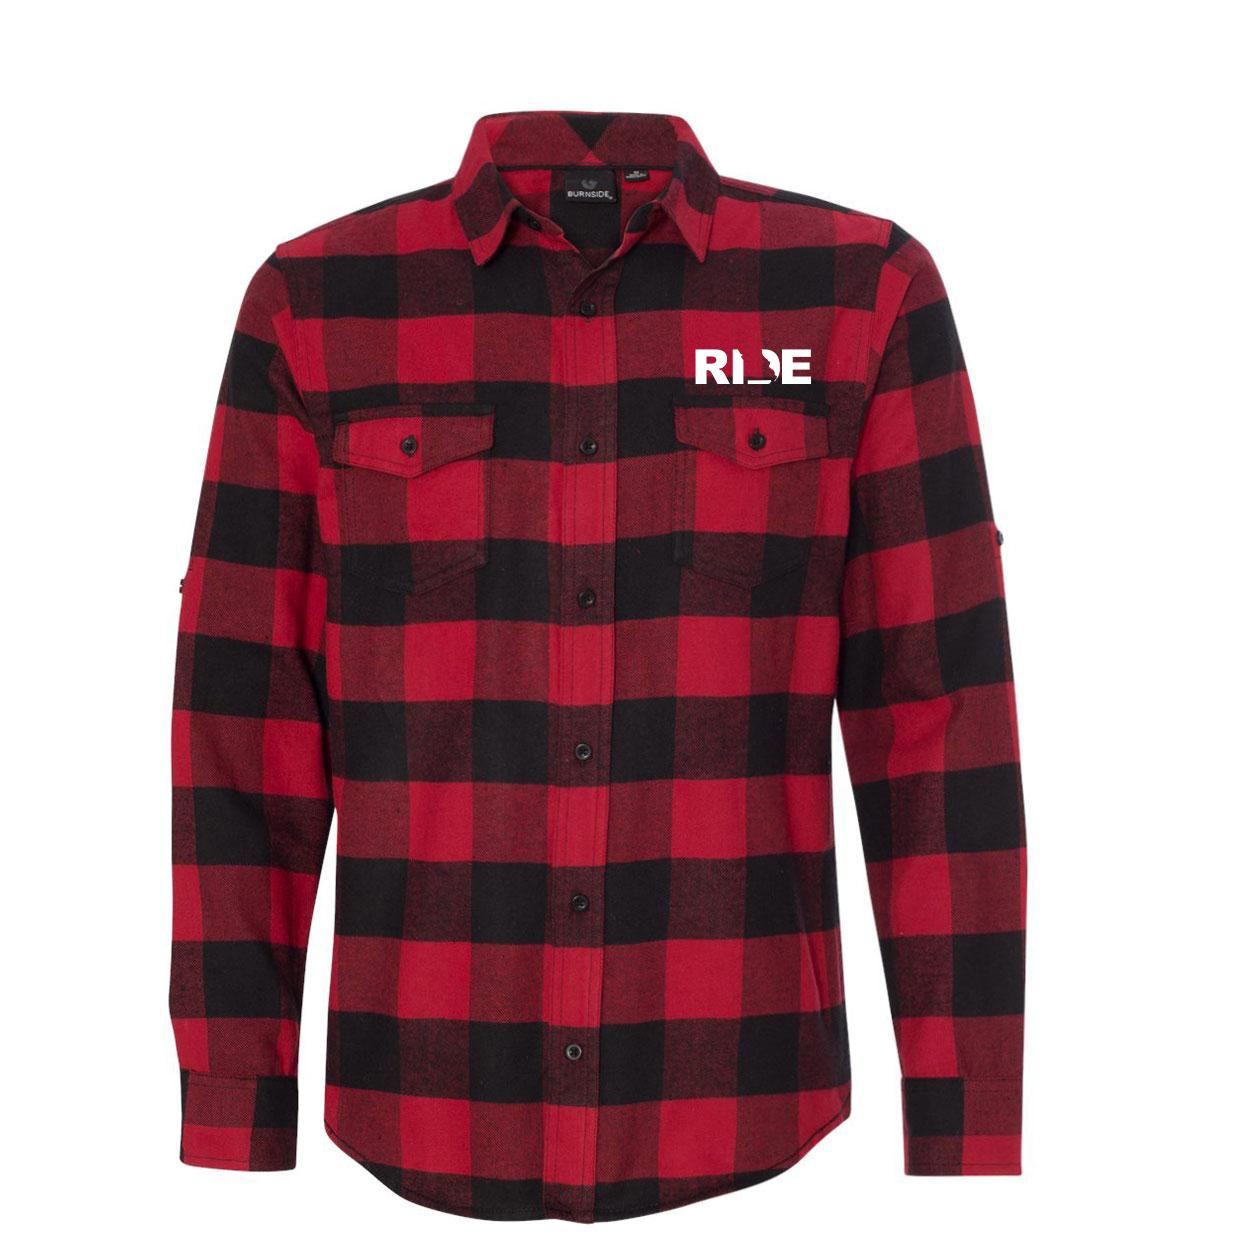 Ride Missouri Classic Unisex Long Sleeve Flannel Shirt Red/Black Buffalo (White Logo)